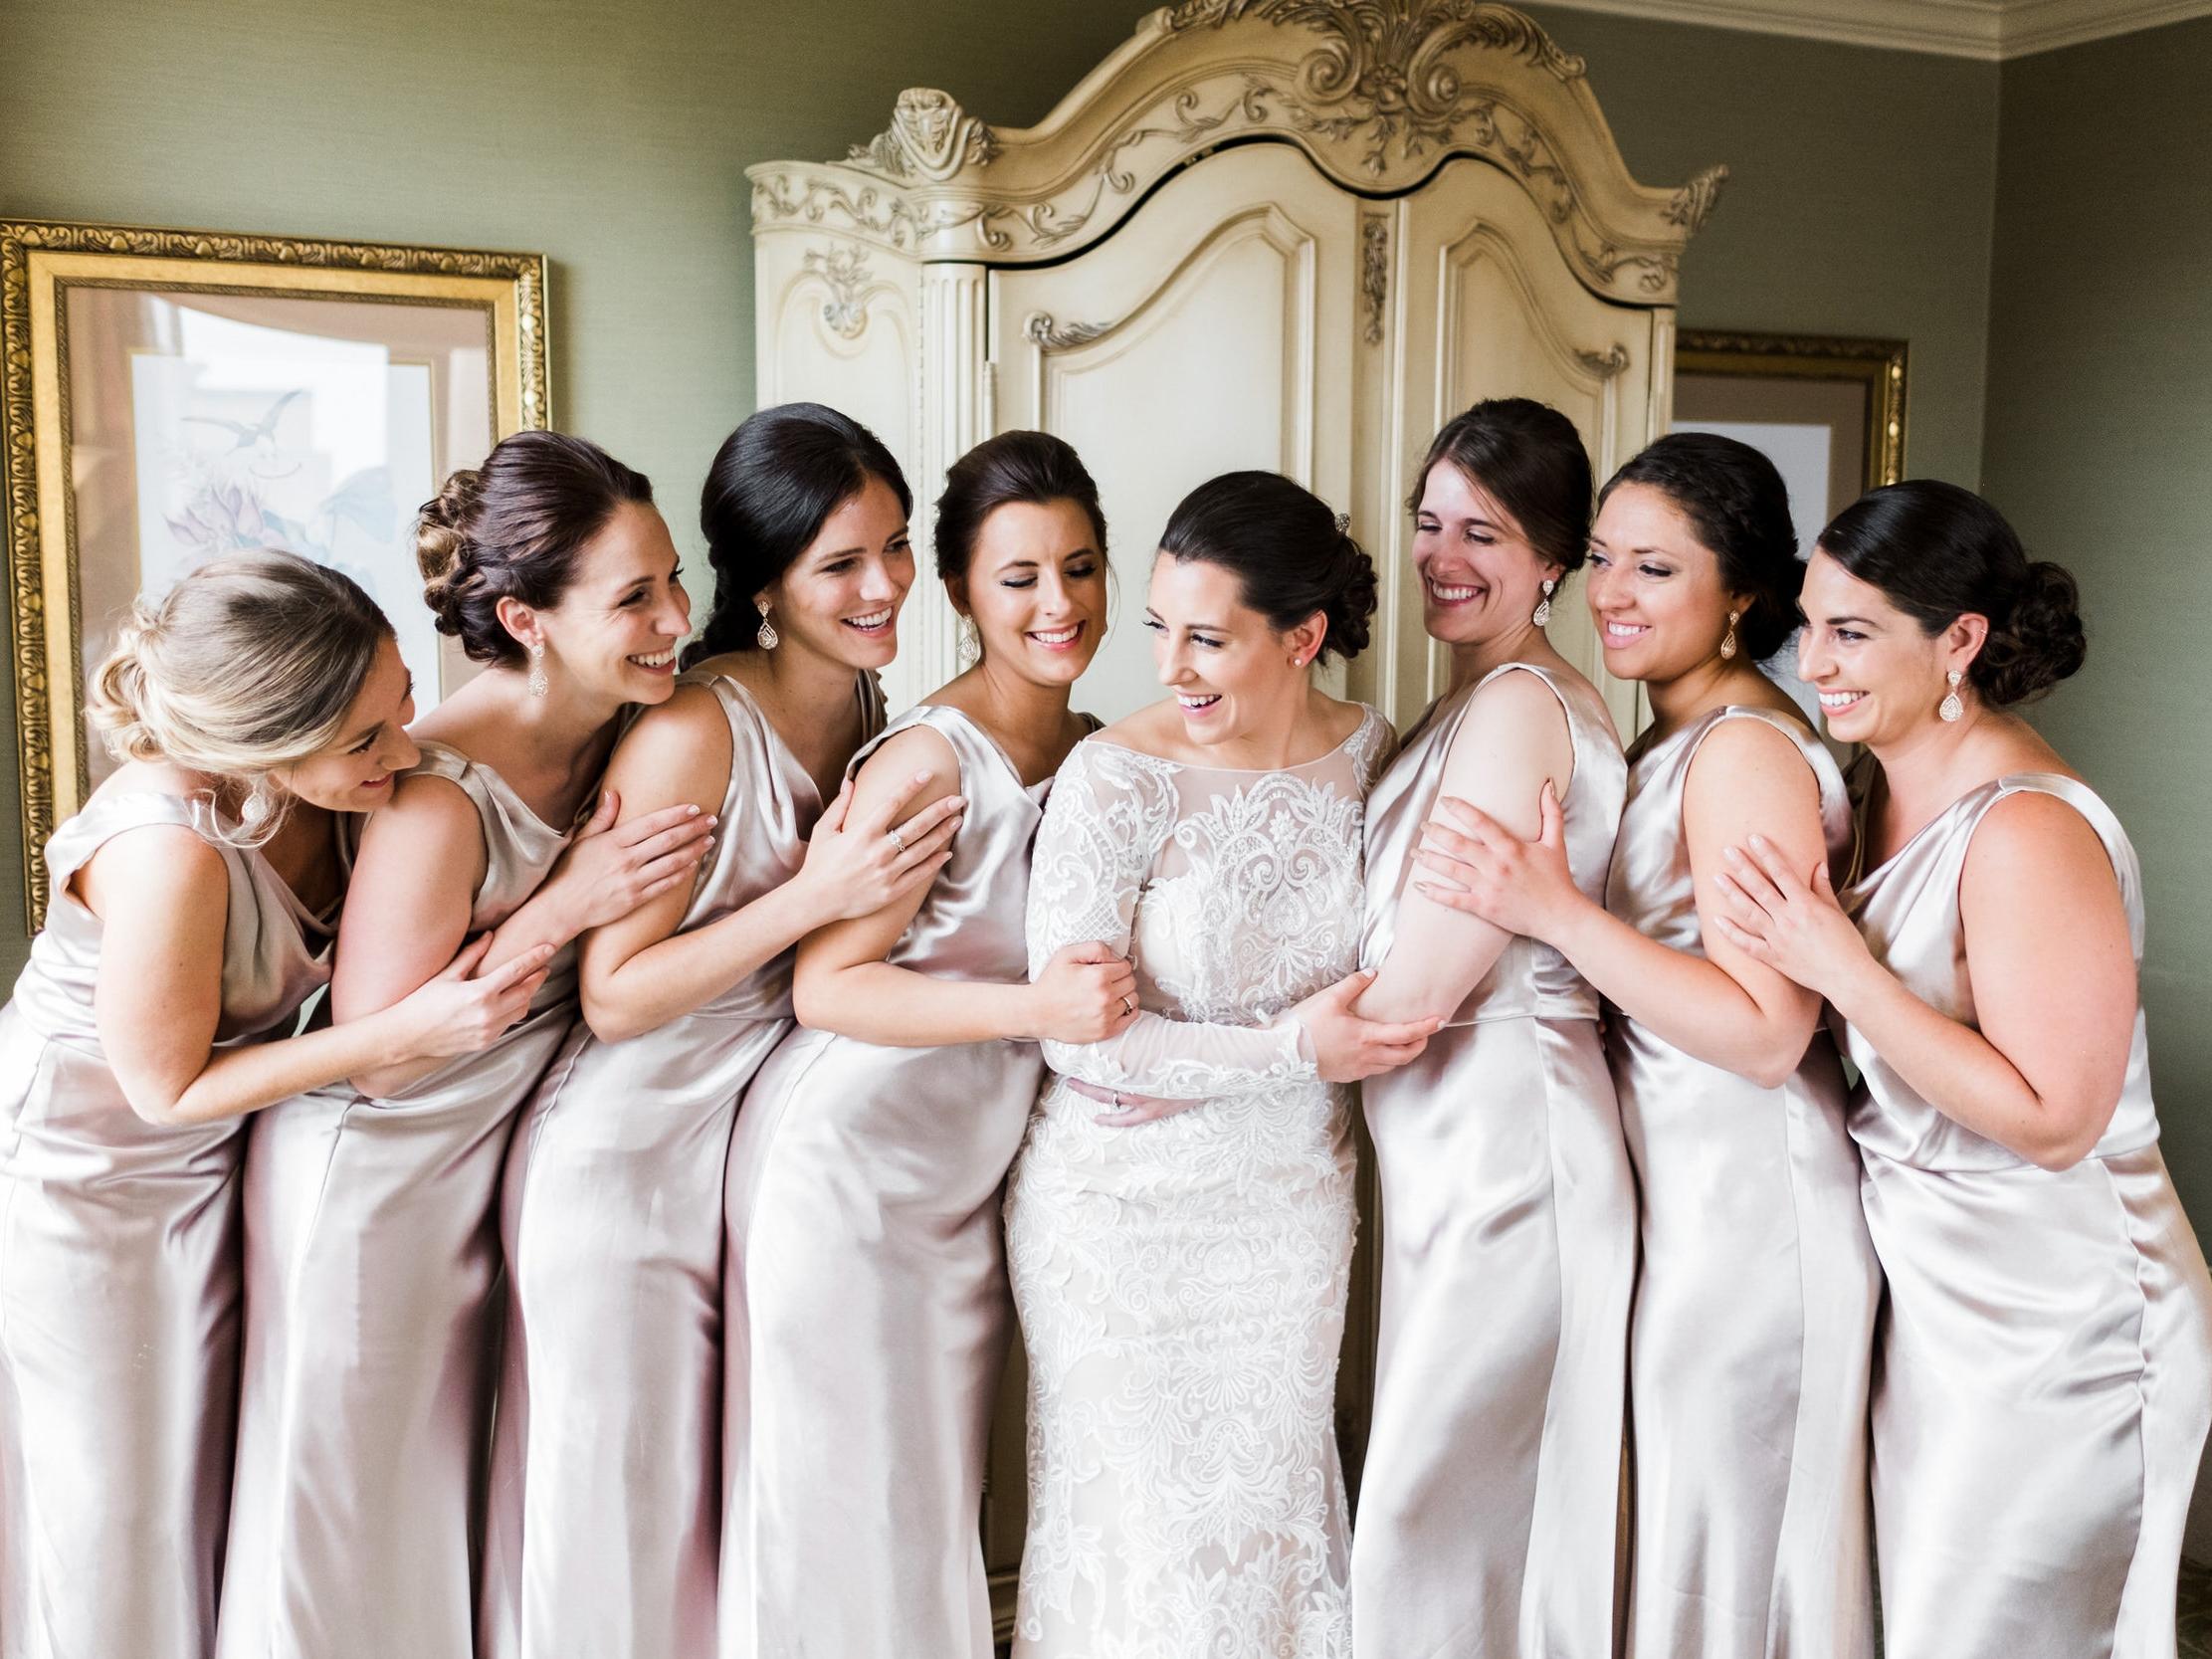 Bridesmaids portraits at the Saint Paul Hotel